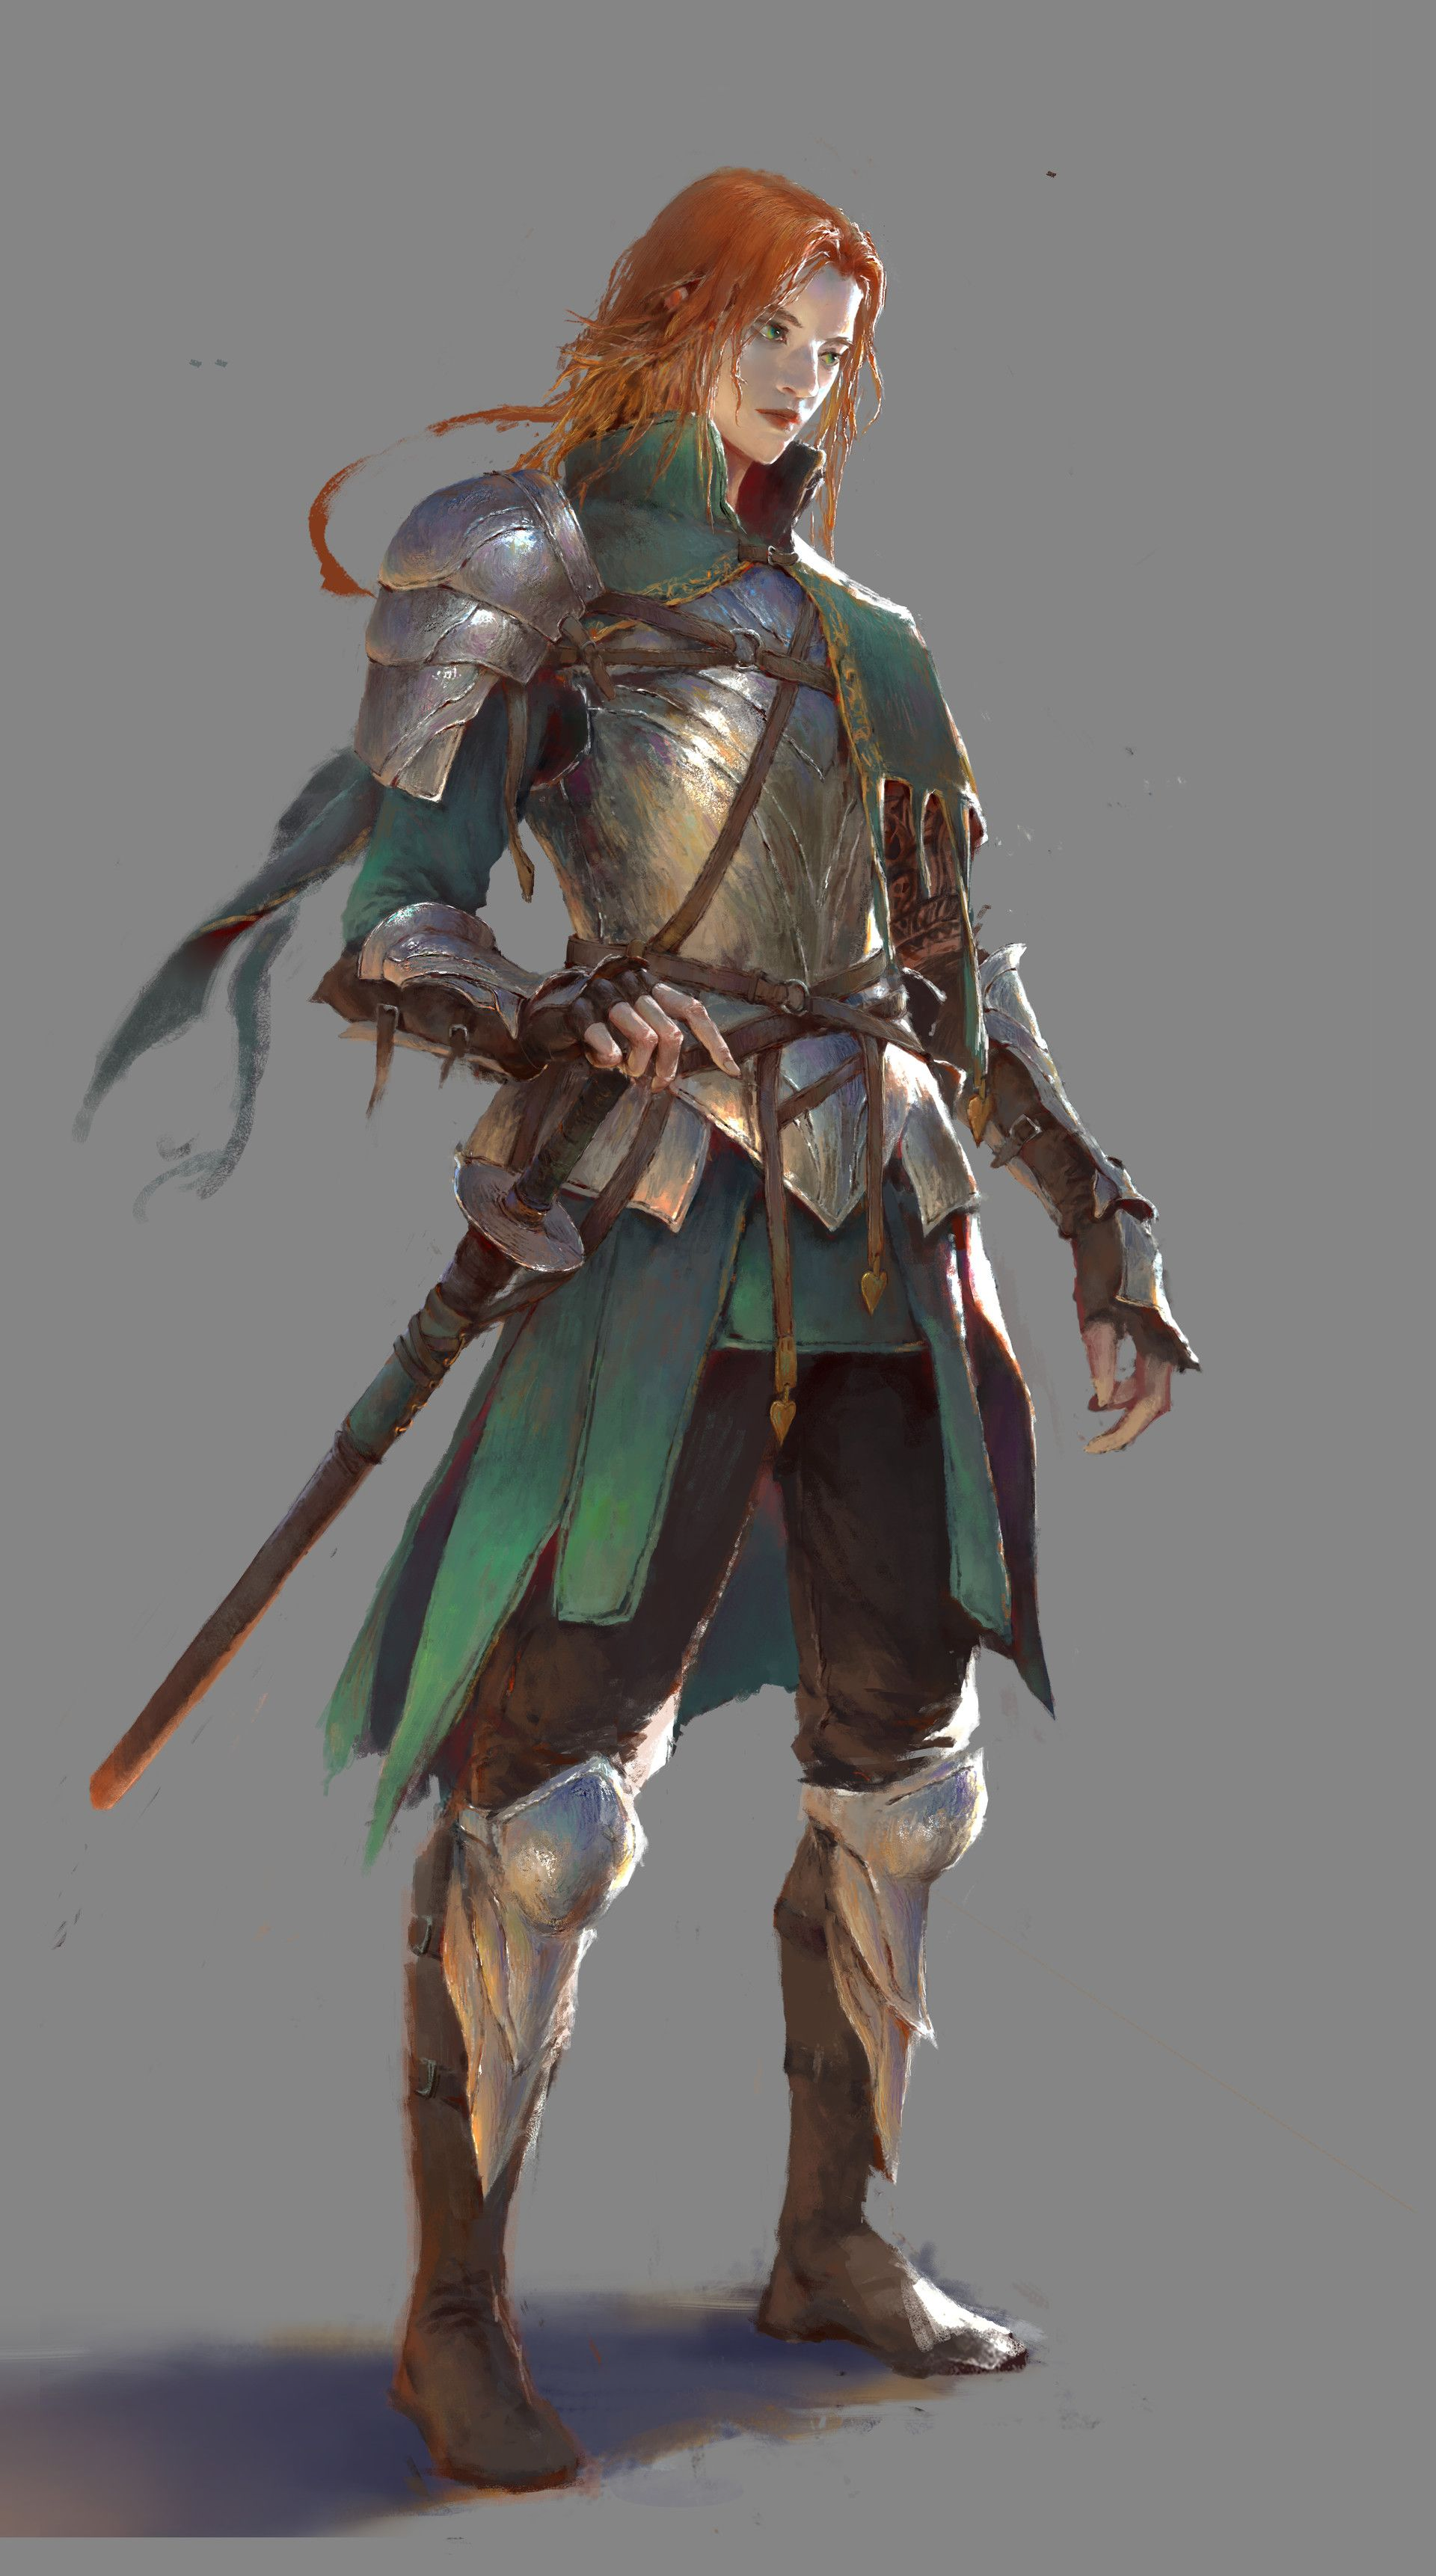 3d Character Design Course : Artstation 绿刀侠 he xiaosong rpg pinterest